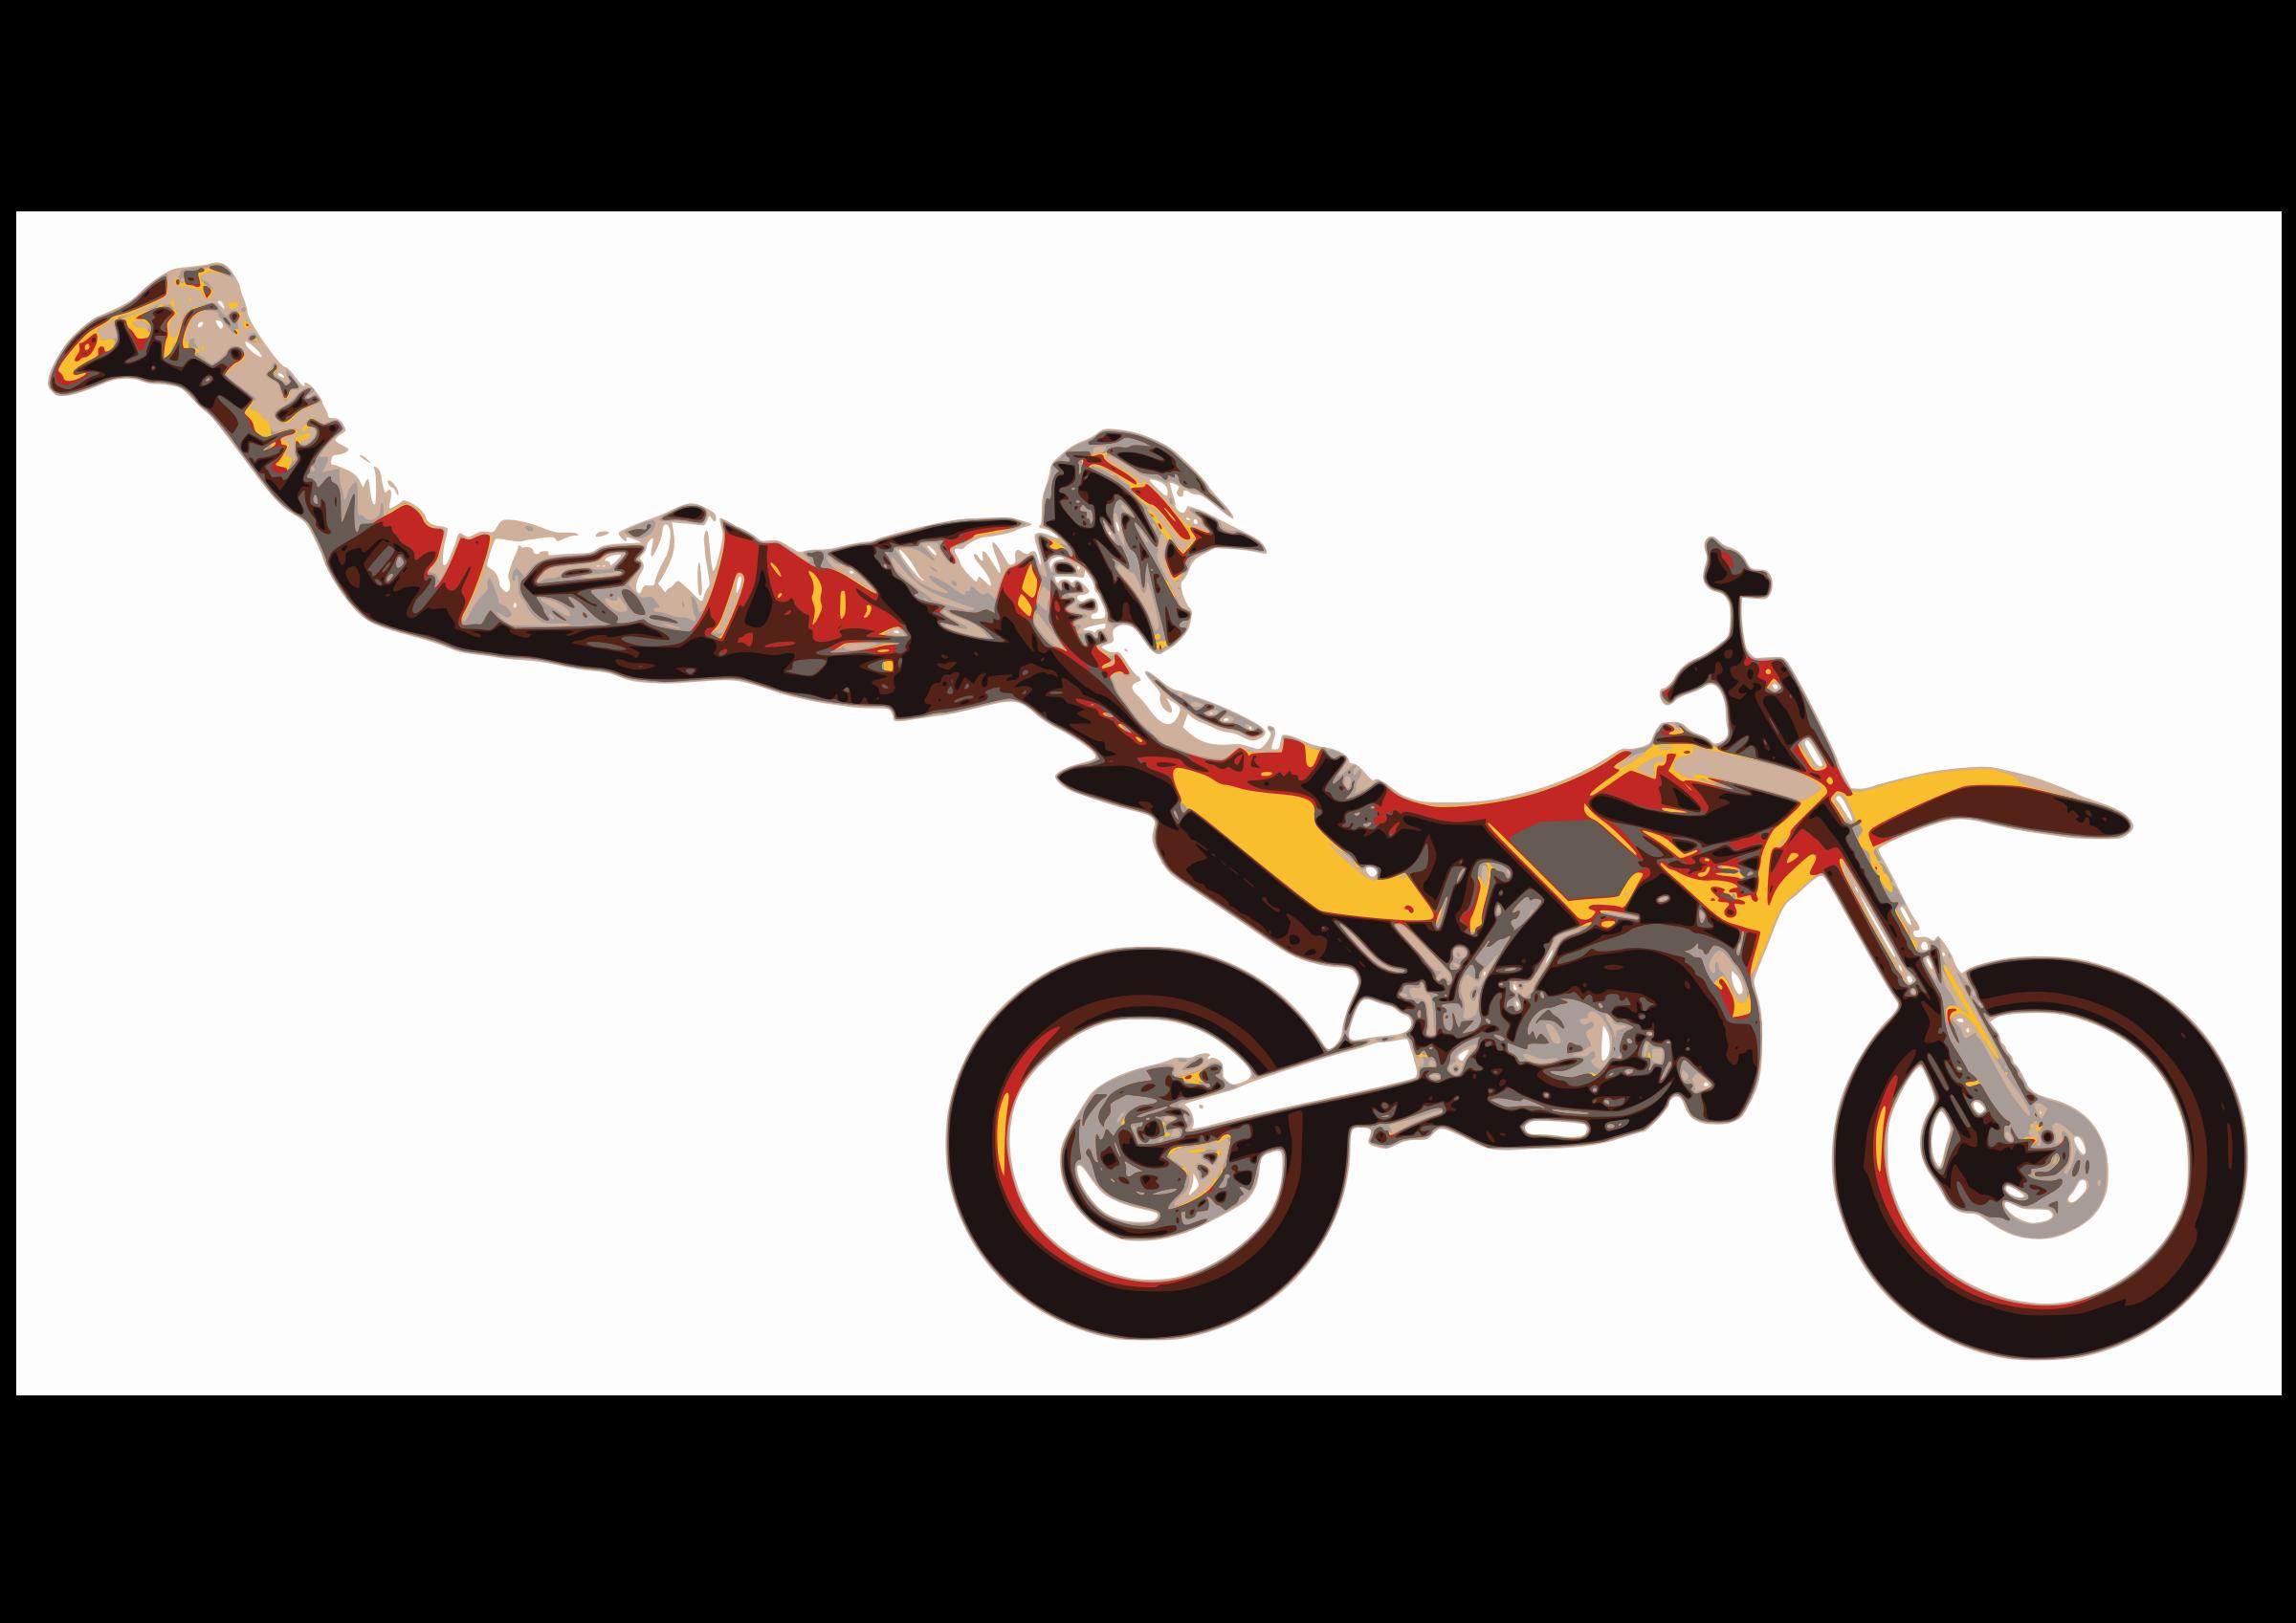 Motor cross clipart jpg free Clipart - motorcycle enduro jpg free